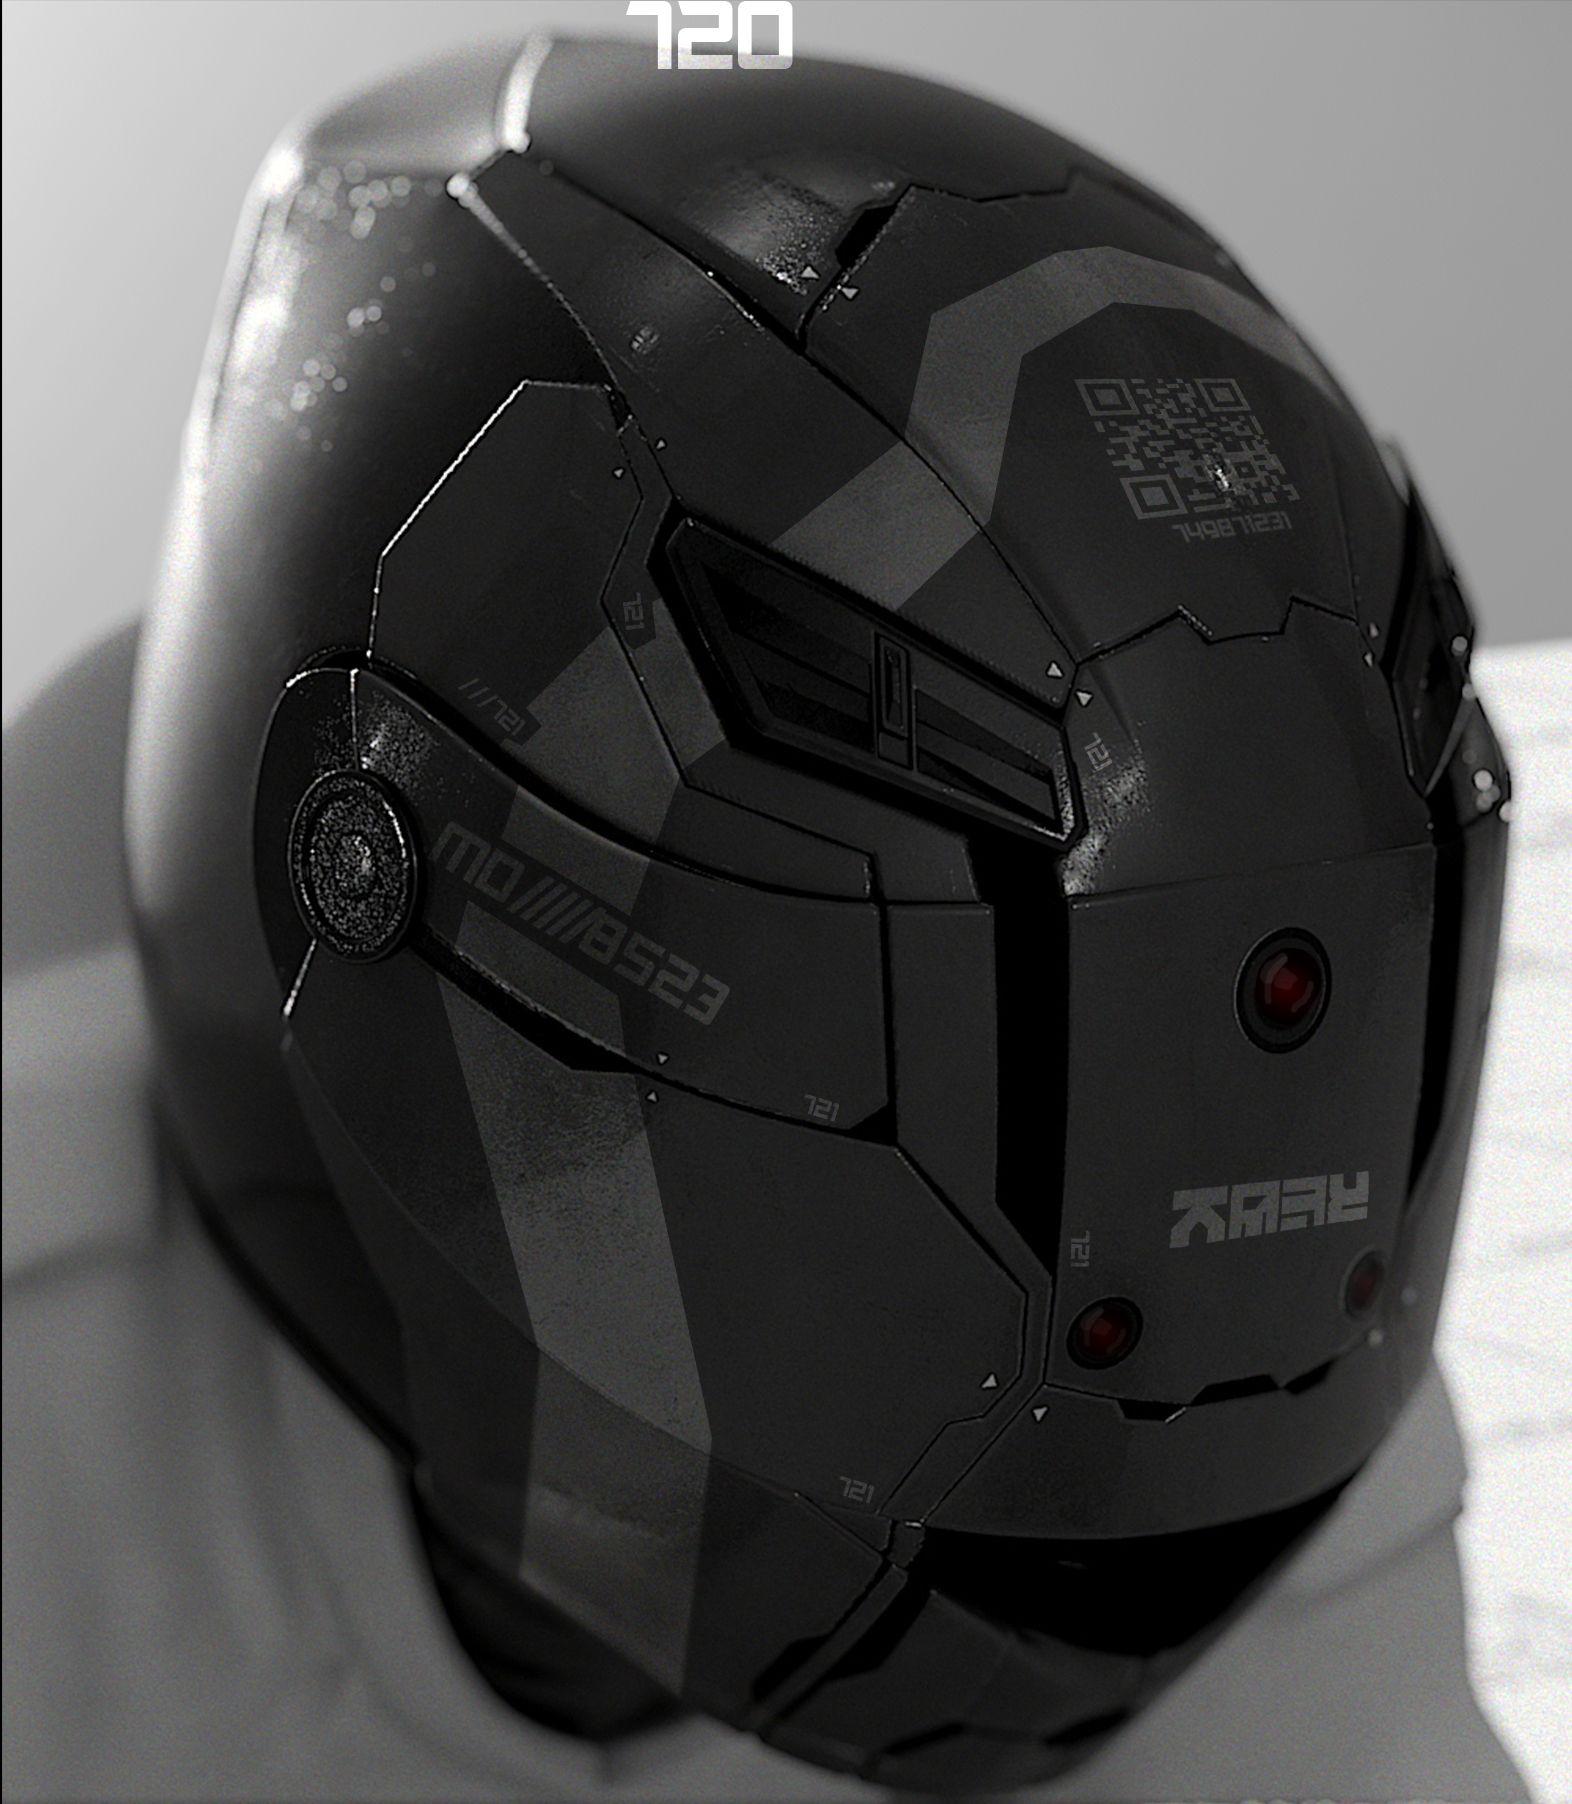 helmet_hitech_by_chechist-d7kzngt.jpg (1572×1804)